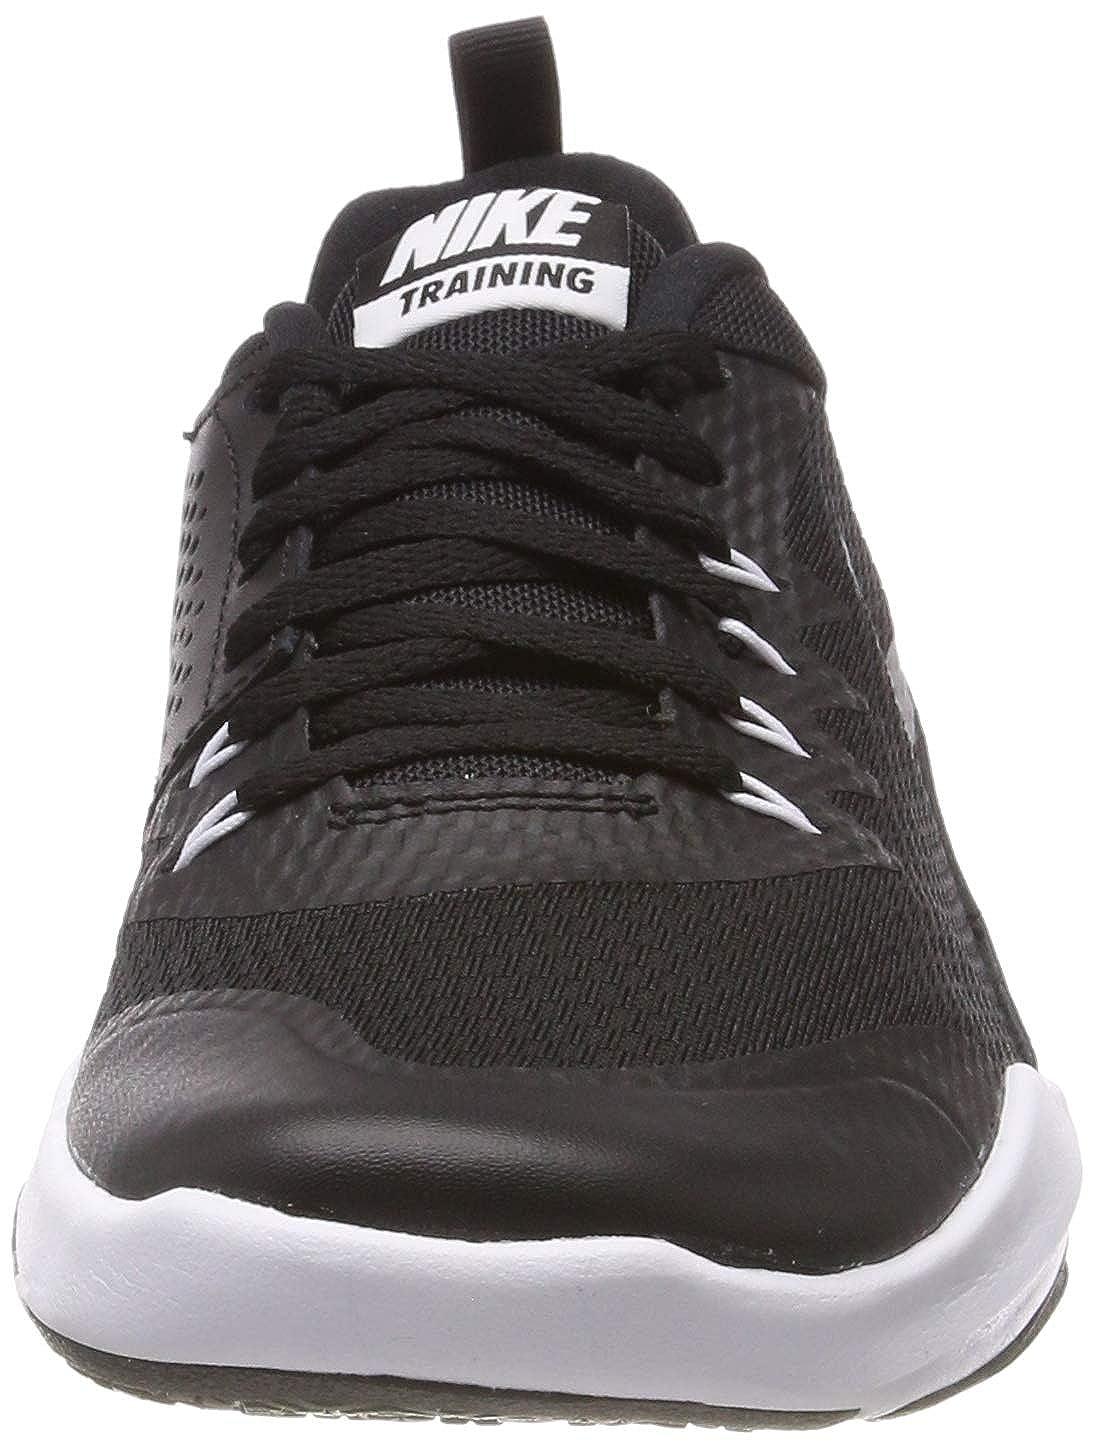 on sale 2e086 3e2a0 Amazon.com   Nike Mens Legend Trainer   Shoes